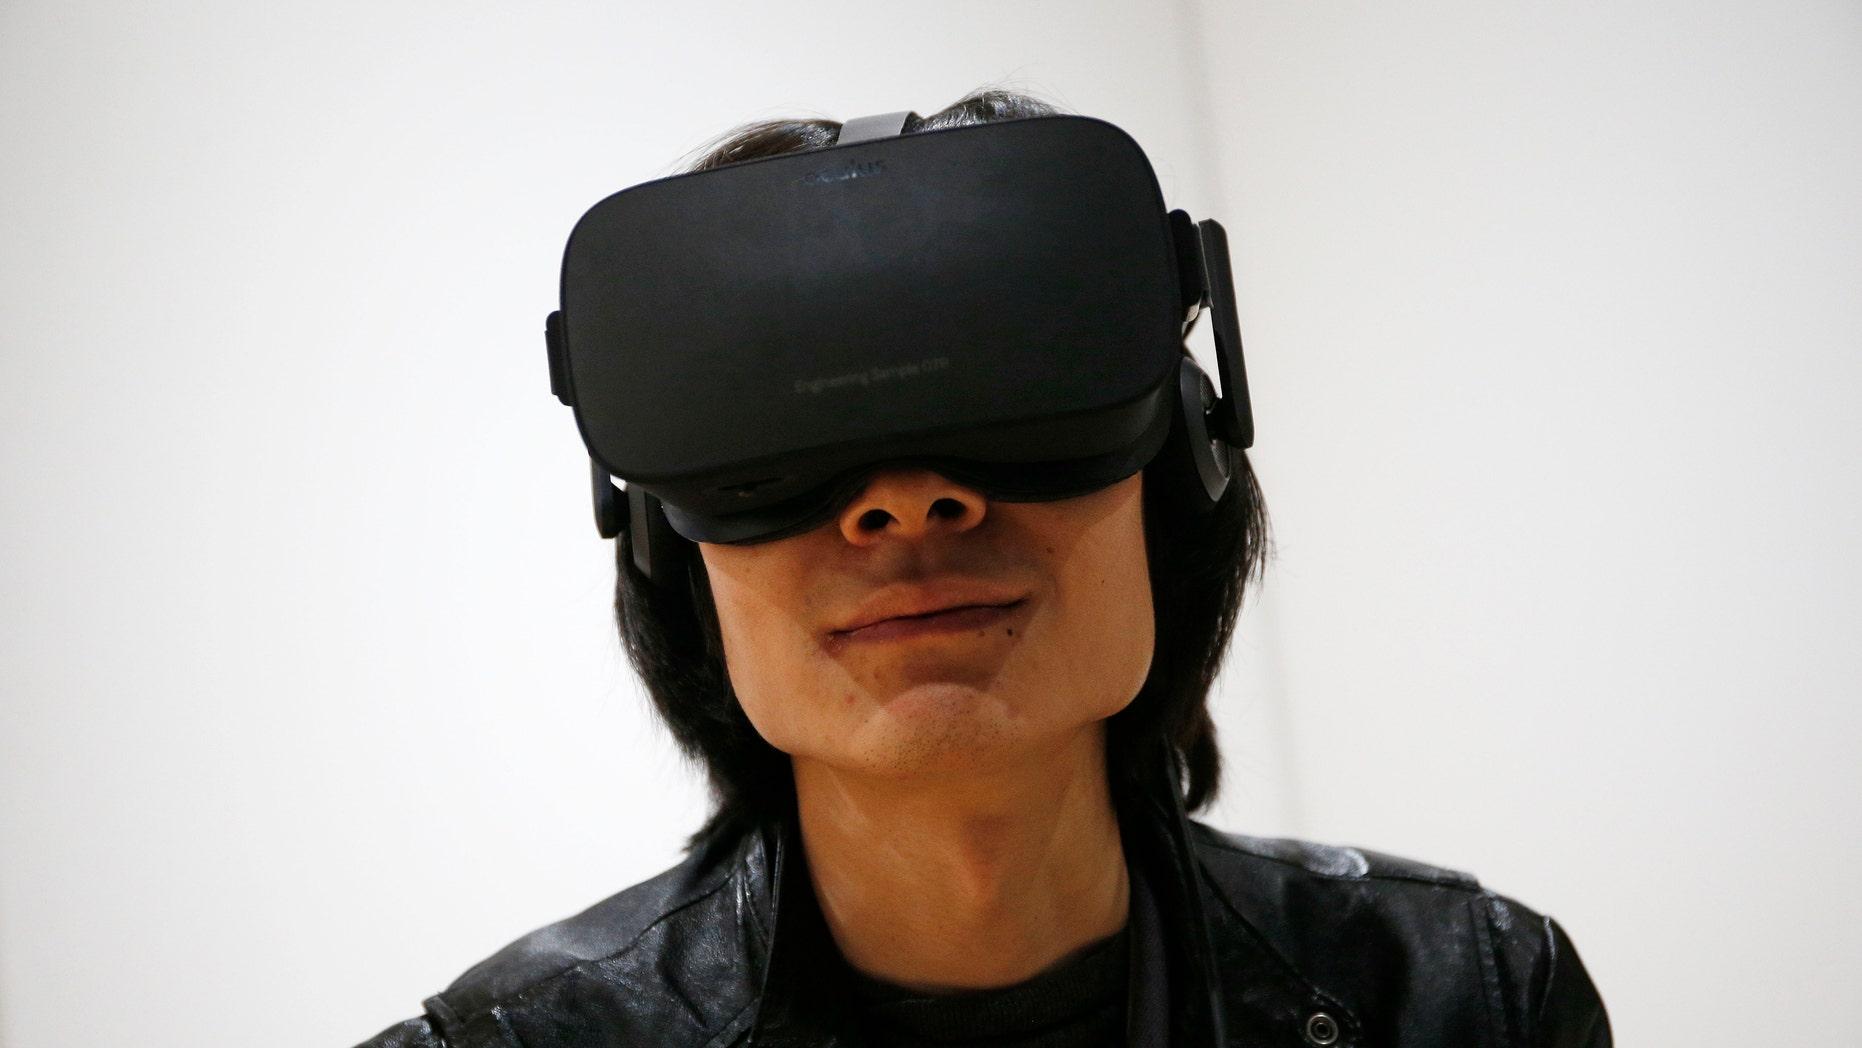 File photo - Peijun Guo wears the Oculus Rift VR headset at the Oculus booth at CES International, Wednesday, Jan. 6, 2016, in Las Vegas. (AP Photo/John Locher)